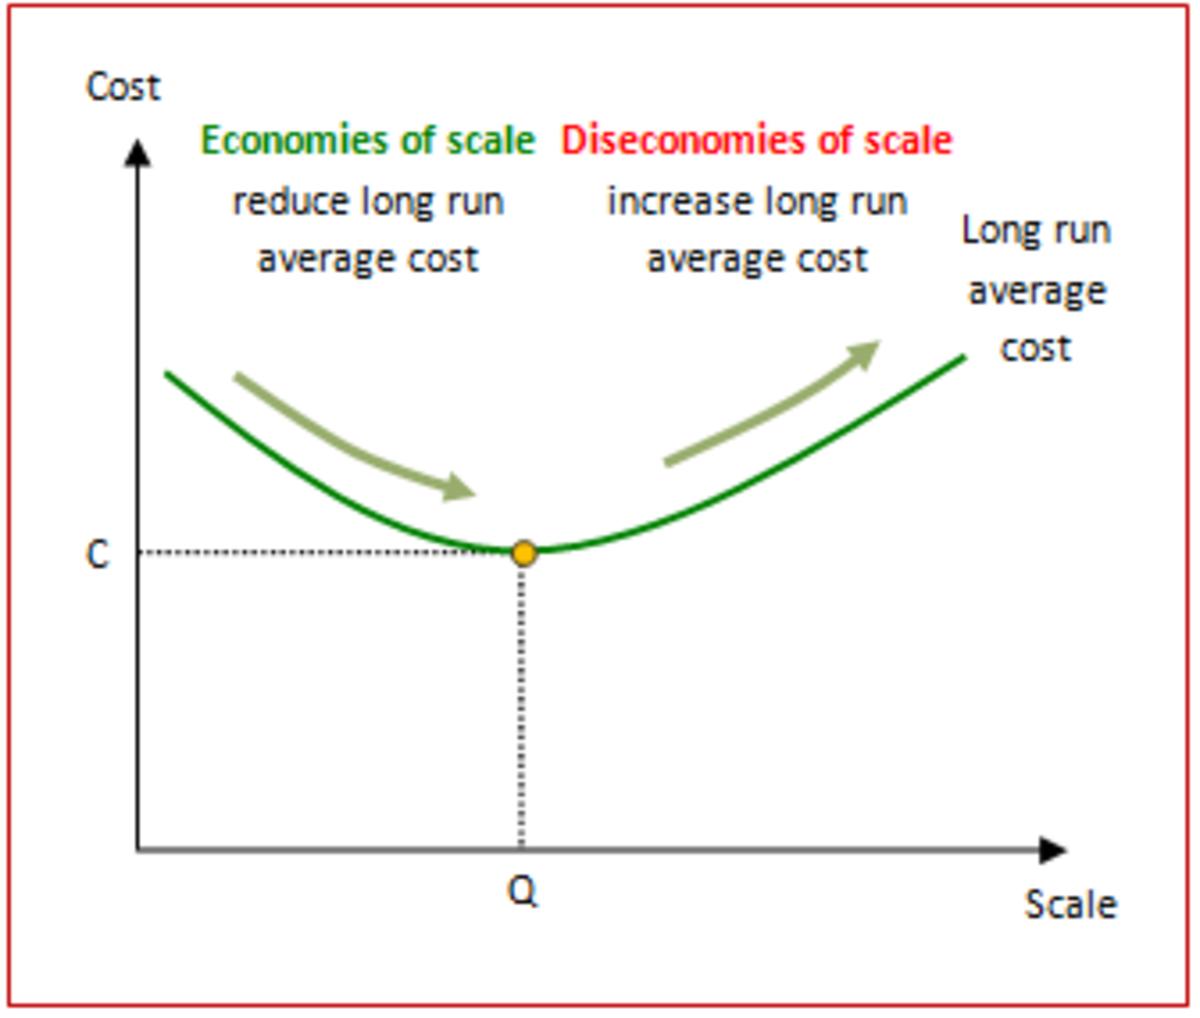 external_economies_diseconomies_of_scale